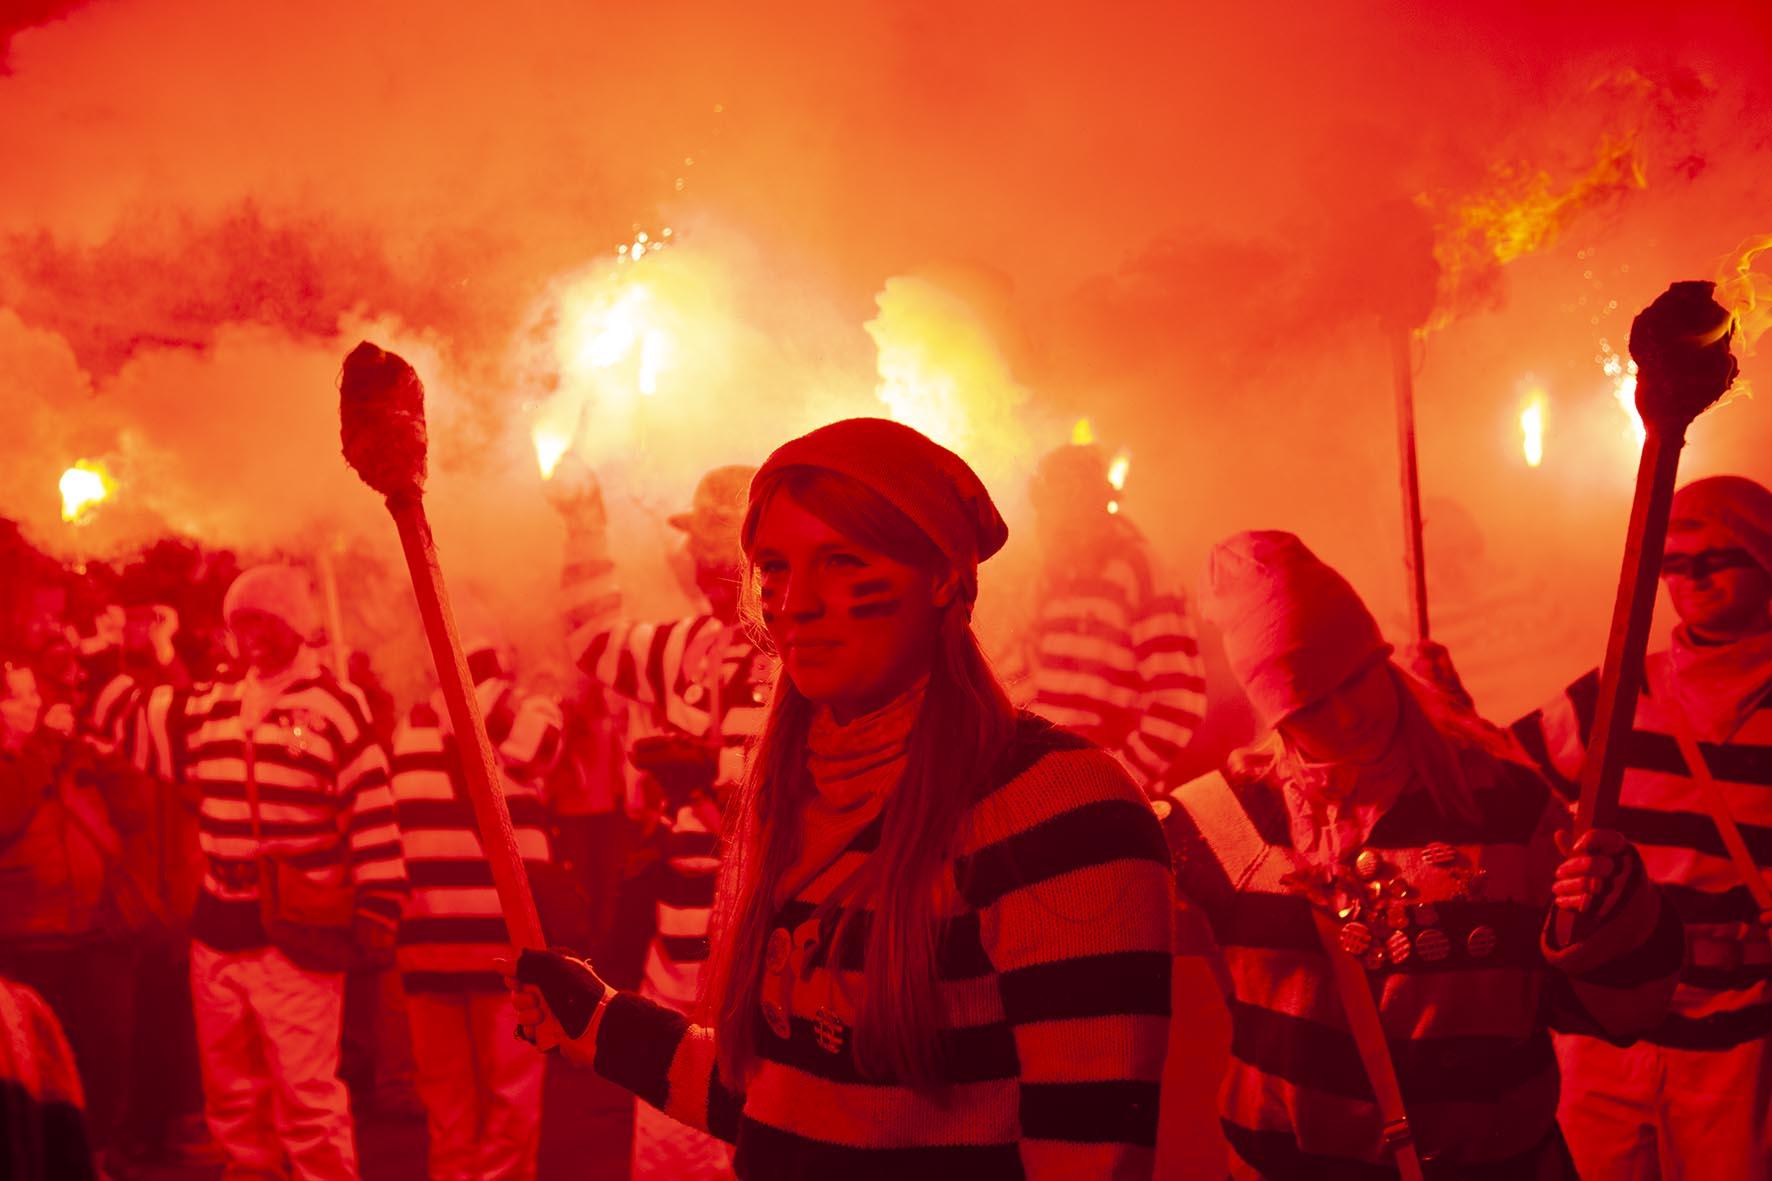 20121105lewes bonfire night_AR.jpg